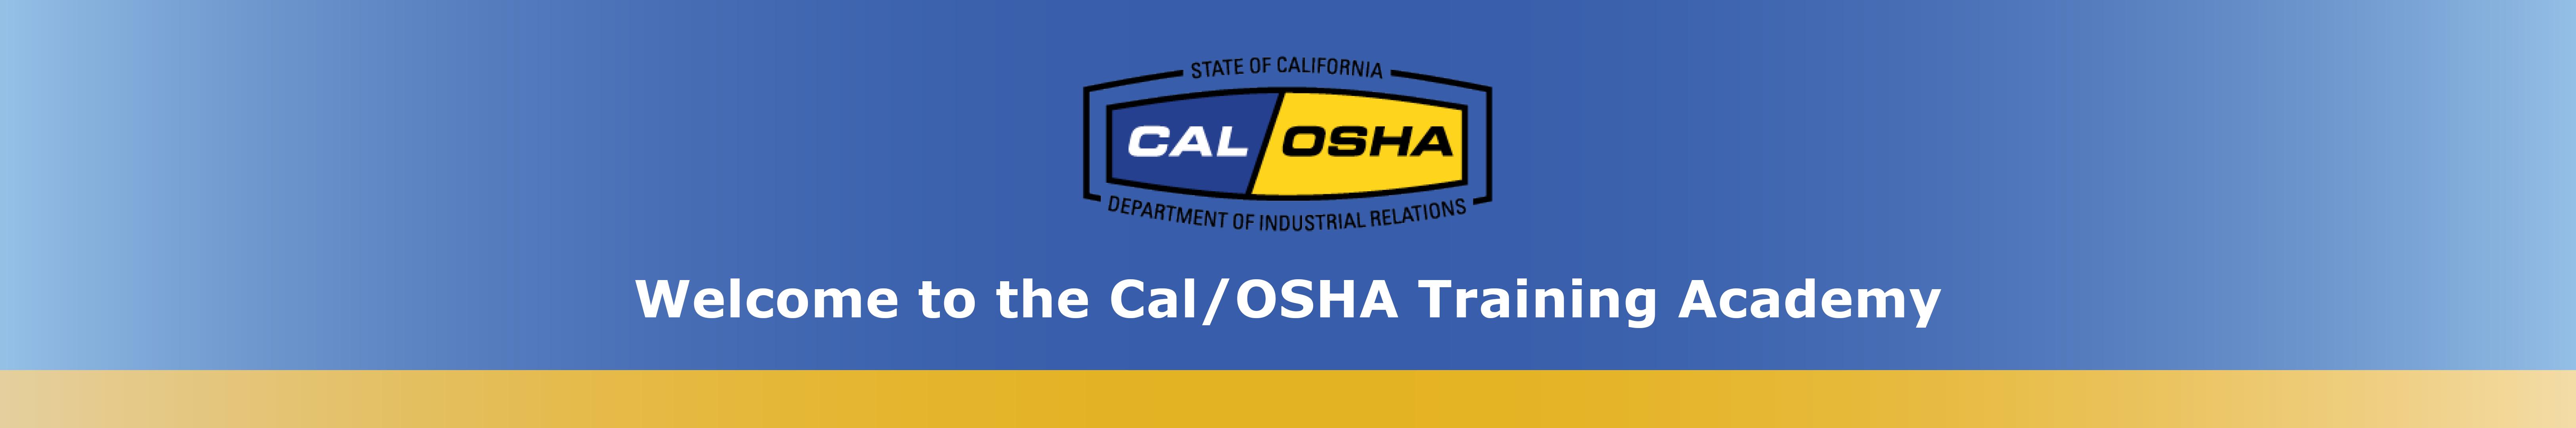 Welcome to the Cal OSHA Training Academy